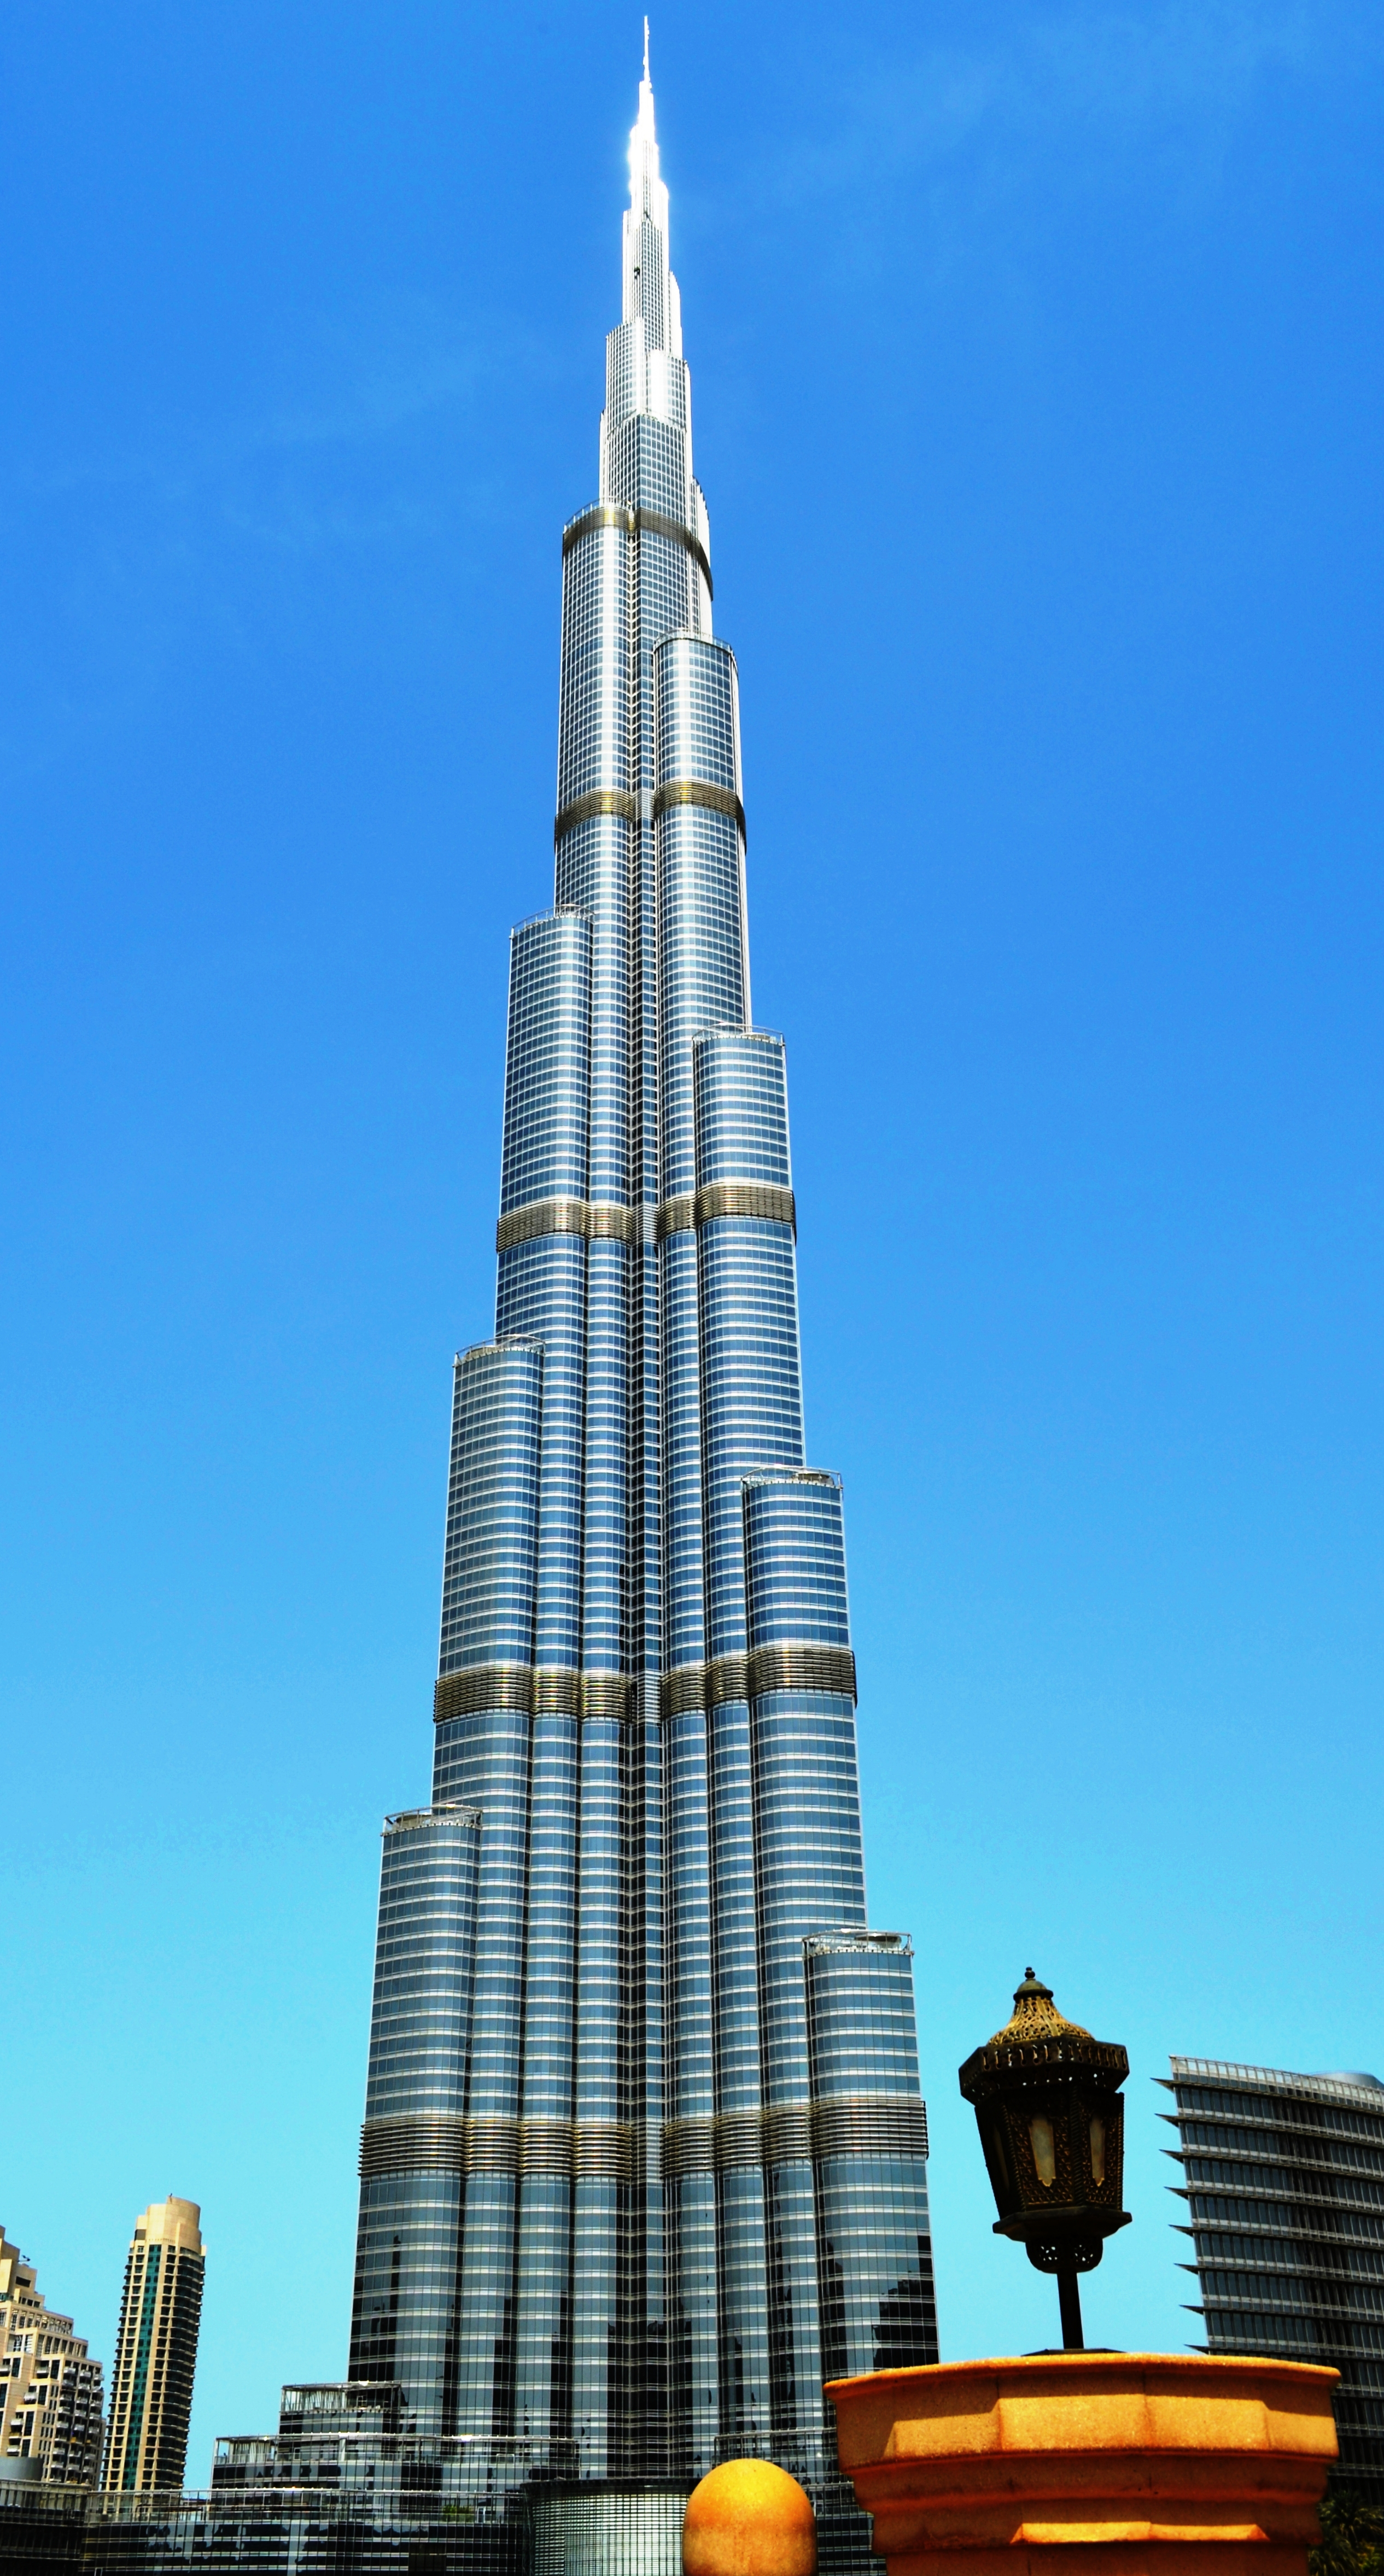 Burj Khalifa Dubai 25314712 121263 HD Wallpaper Res 2531x4712 2531x4712